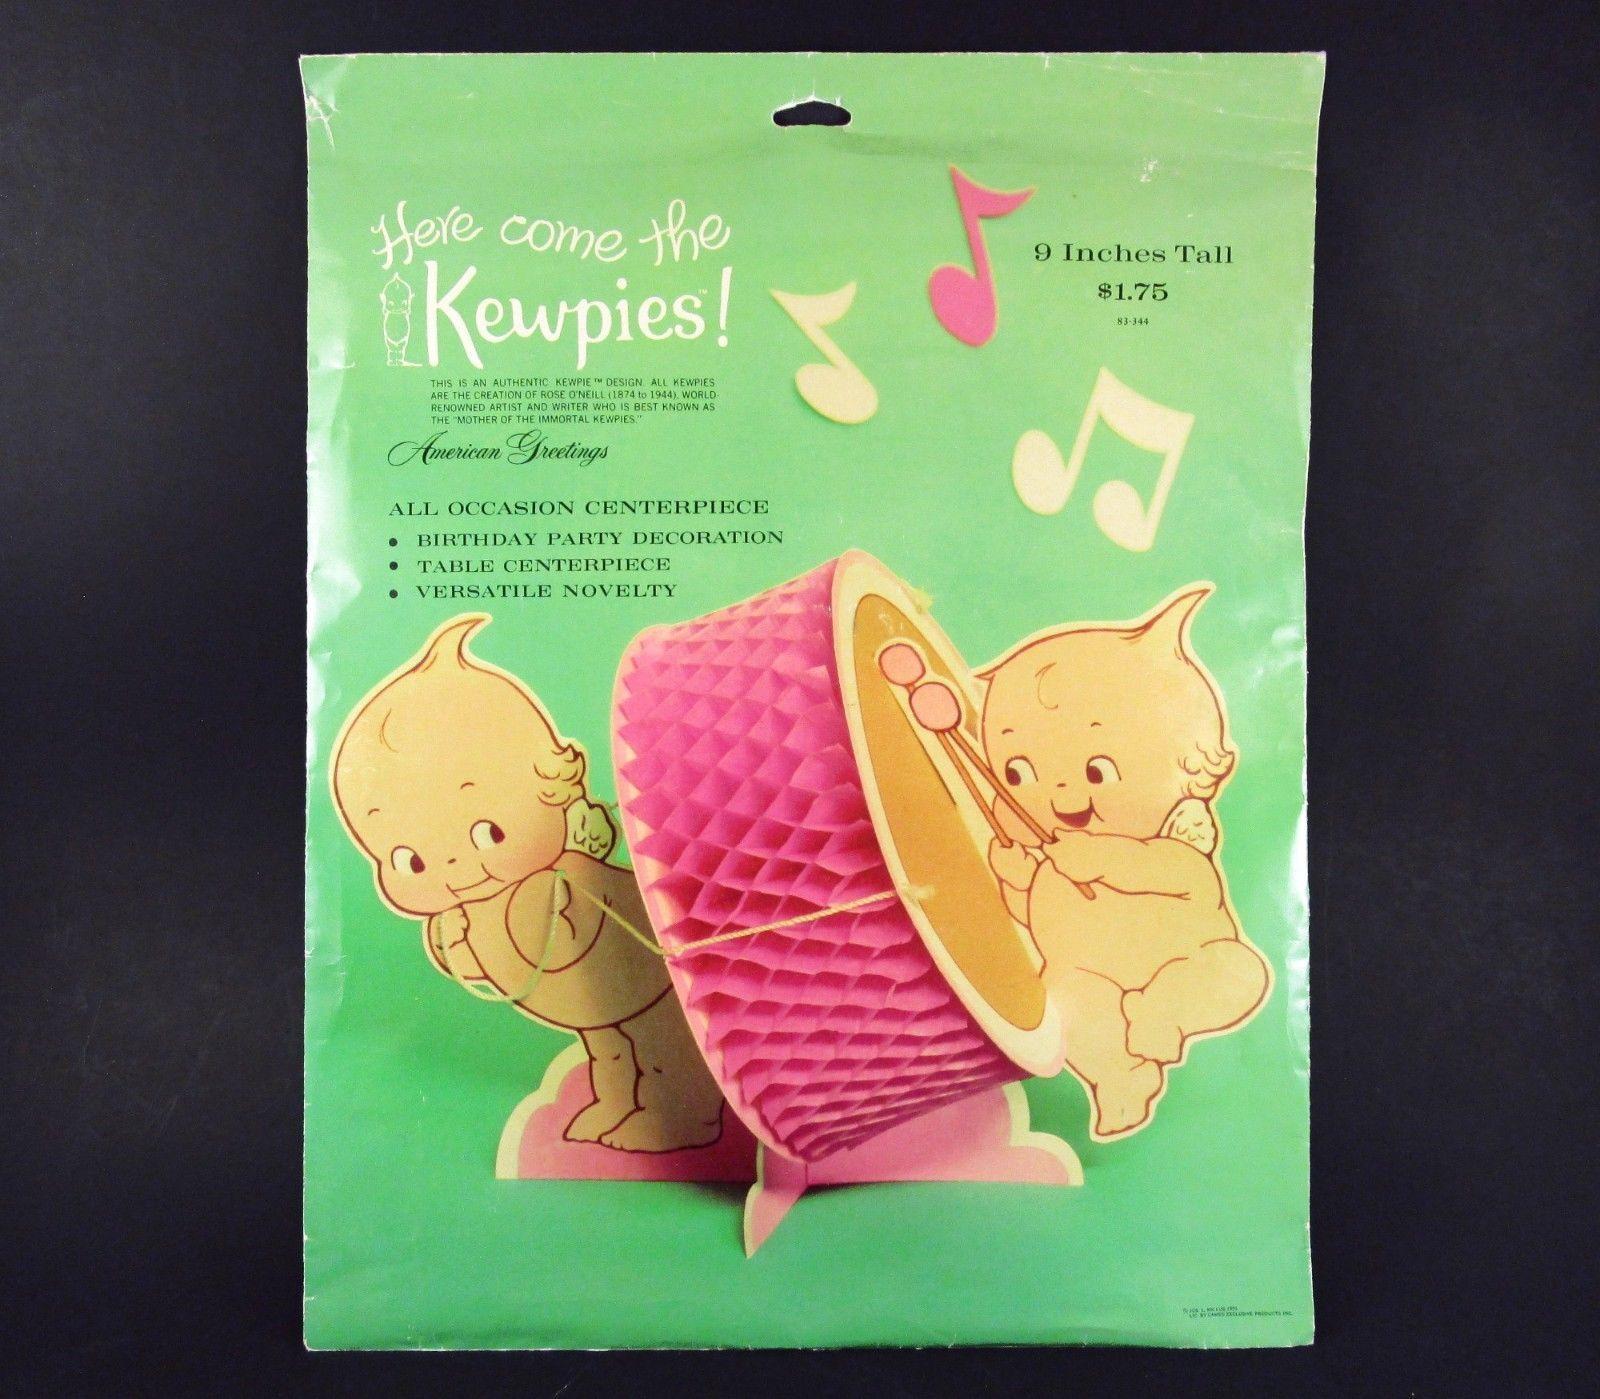 Rare Kewpies Honeycomb Drum Centerpiece 1973 American Greetings